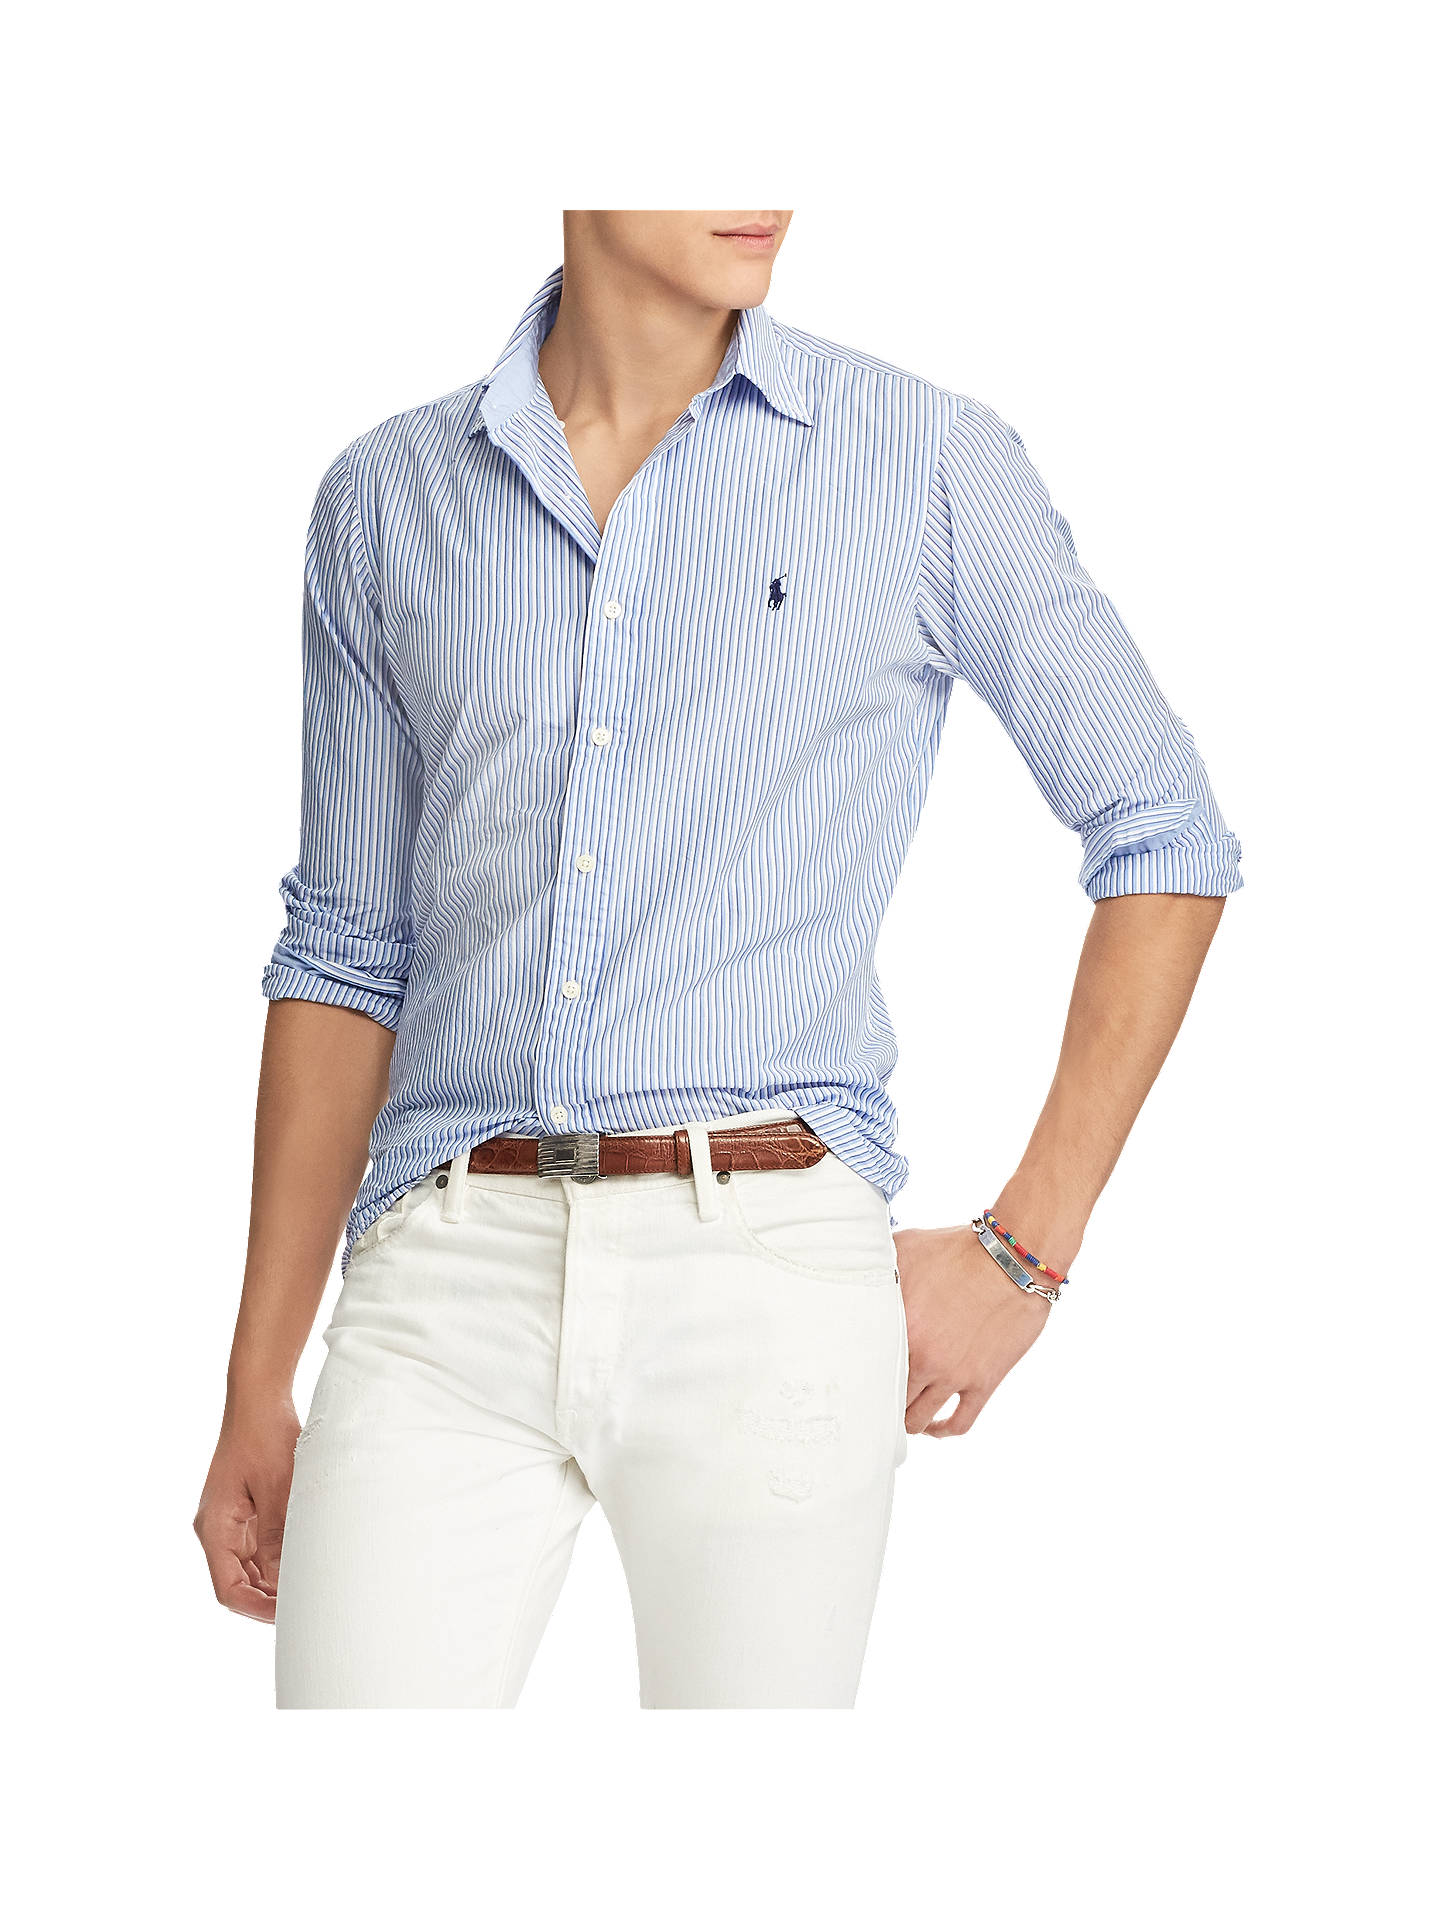 905ff137b43c Buy Polo Ralph Lauren Stripe Cotton Poplin Shirt